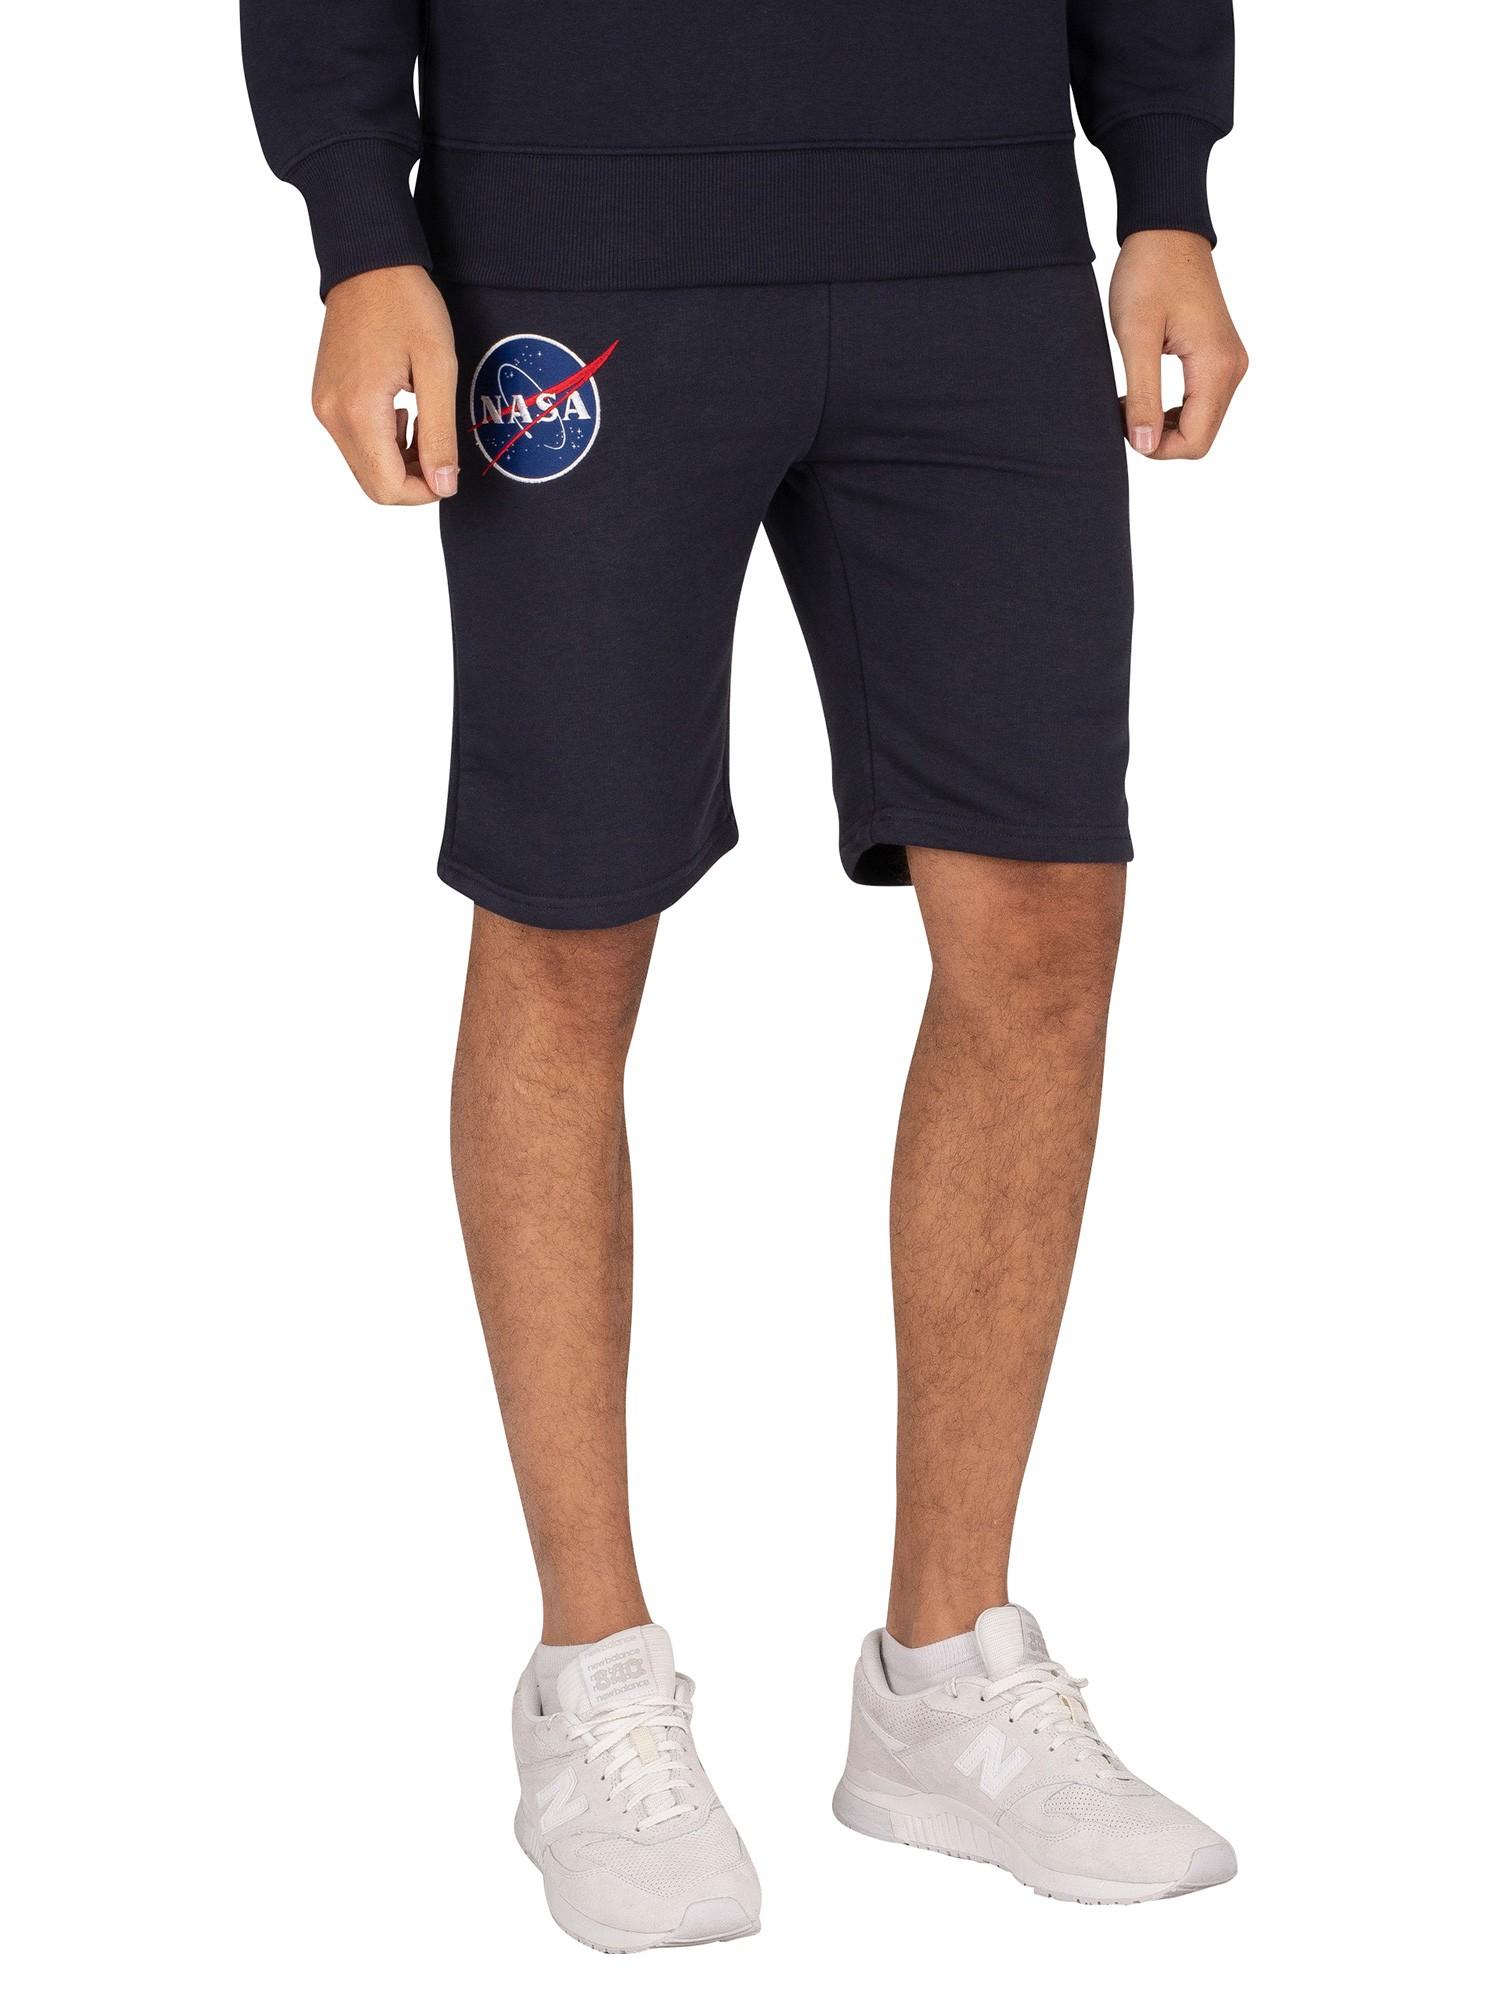 NASA Basic Sweat Shorts